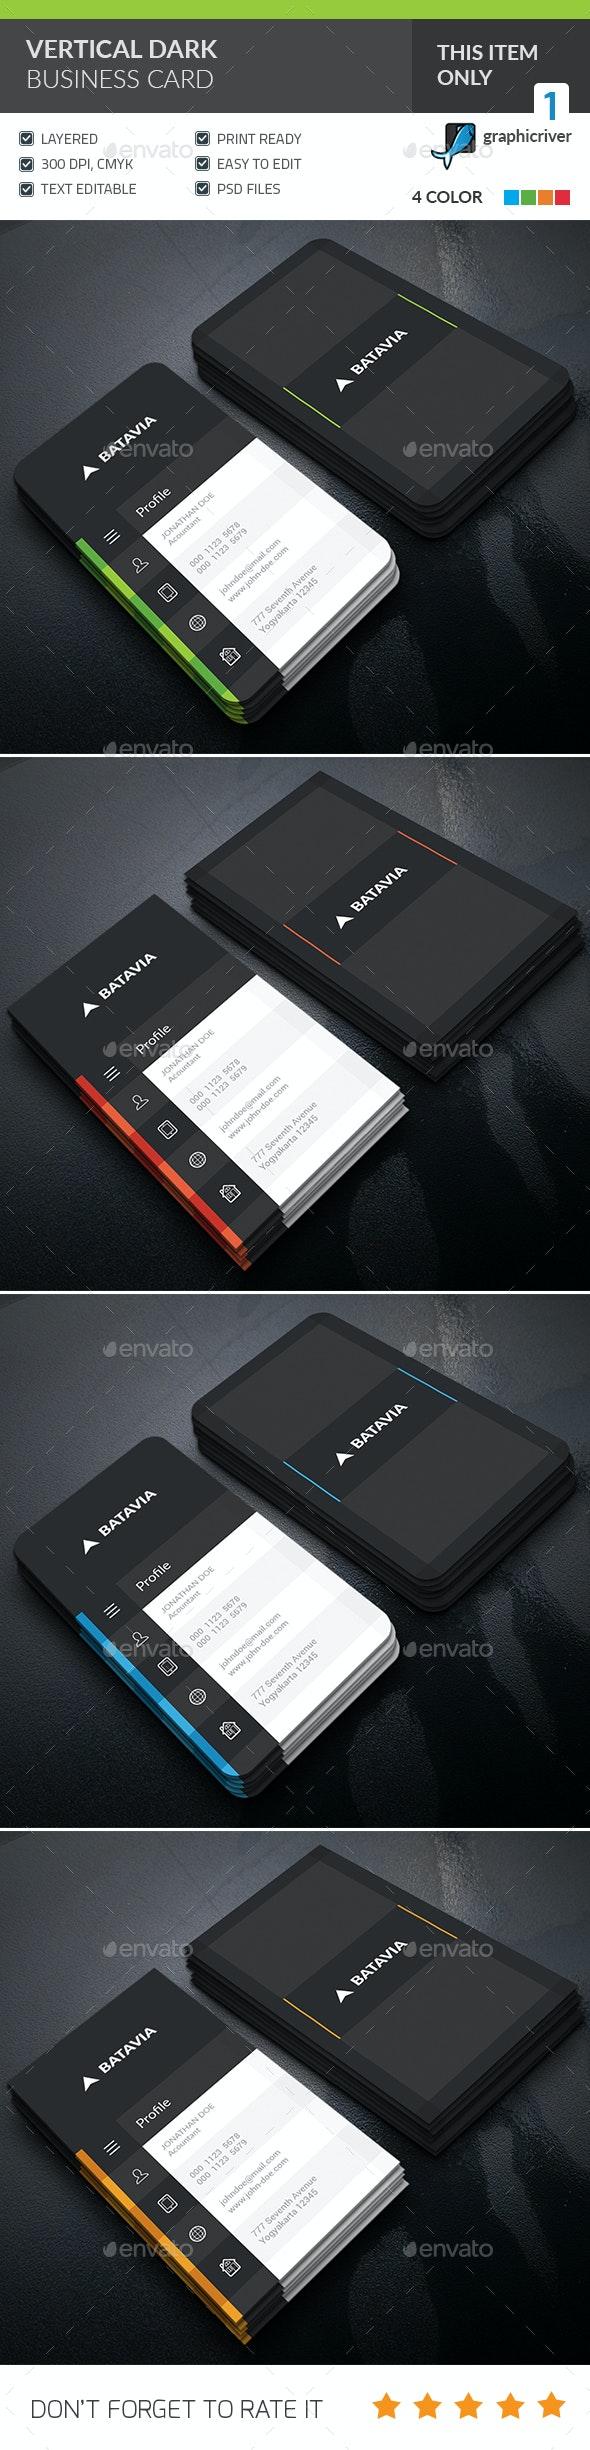 Dark Vertical Business Card - Corporate Business Cards